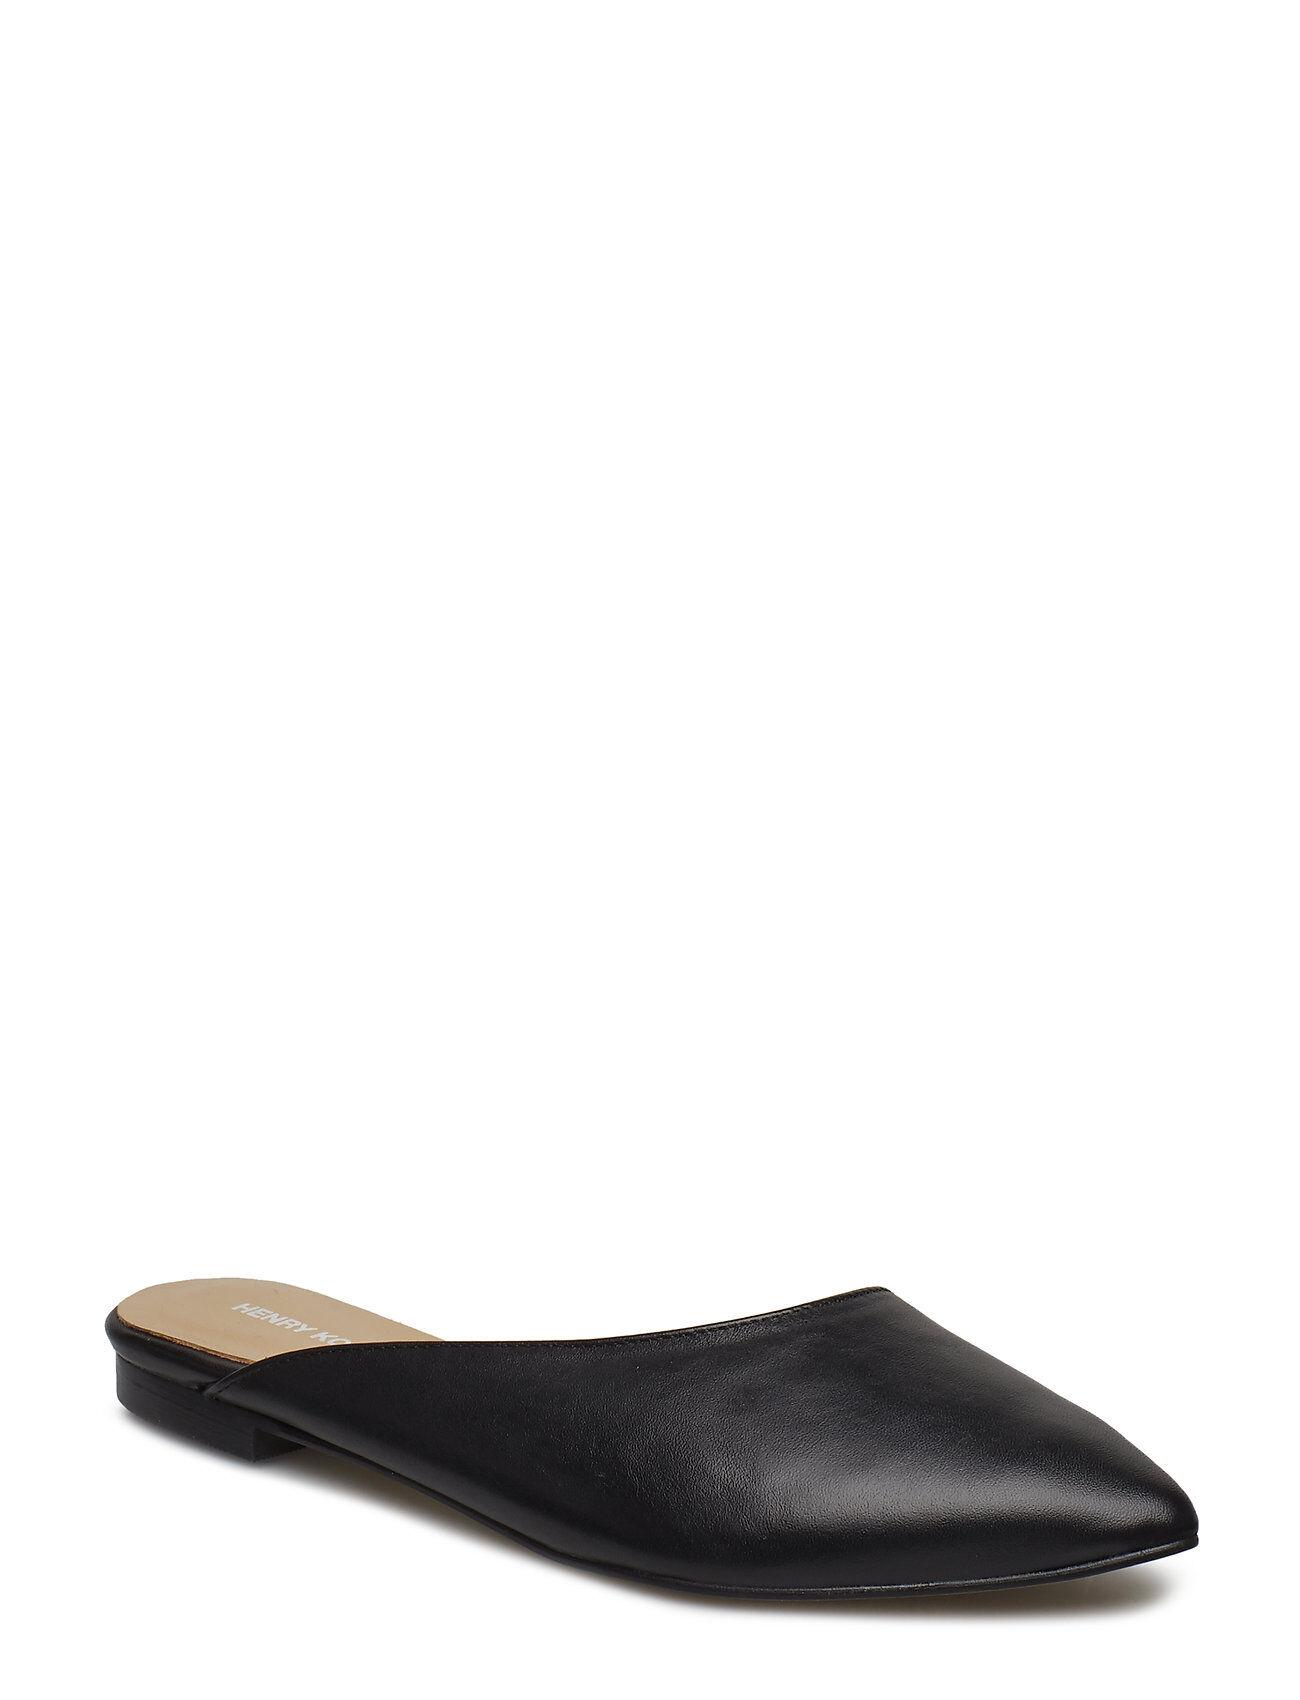 Henry Kole Gail Leather Black Matalapohjaiset Sandaalit Musta Henry Kole